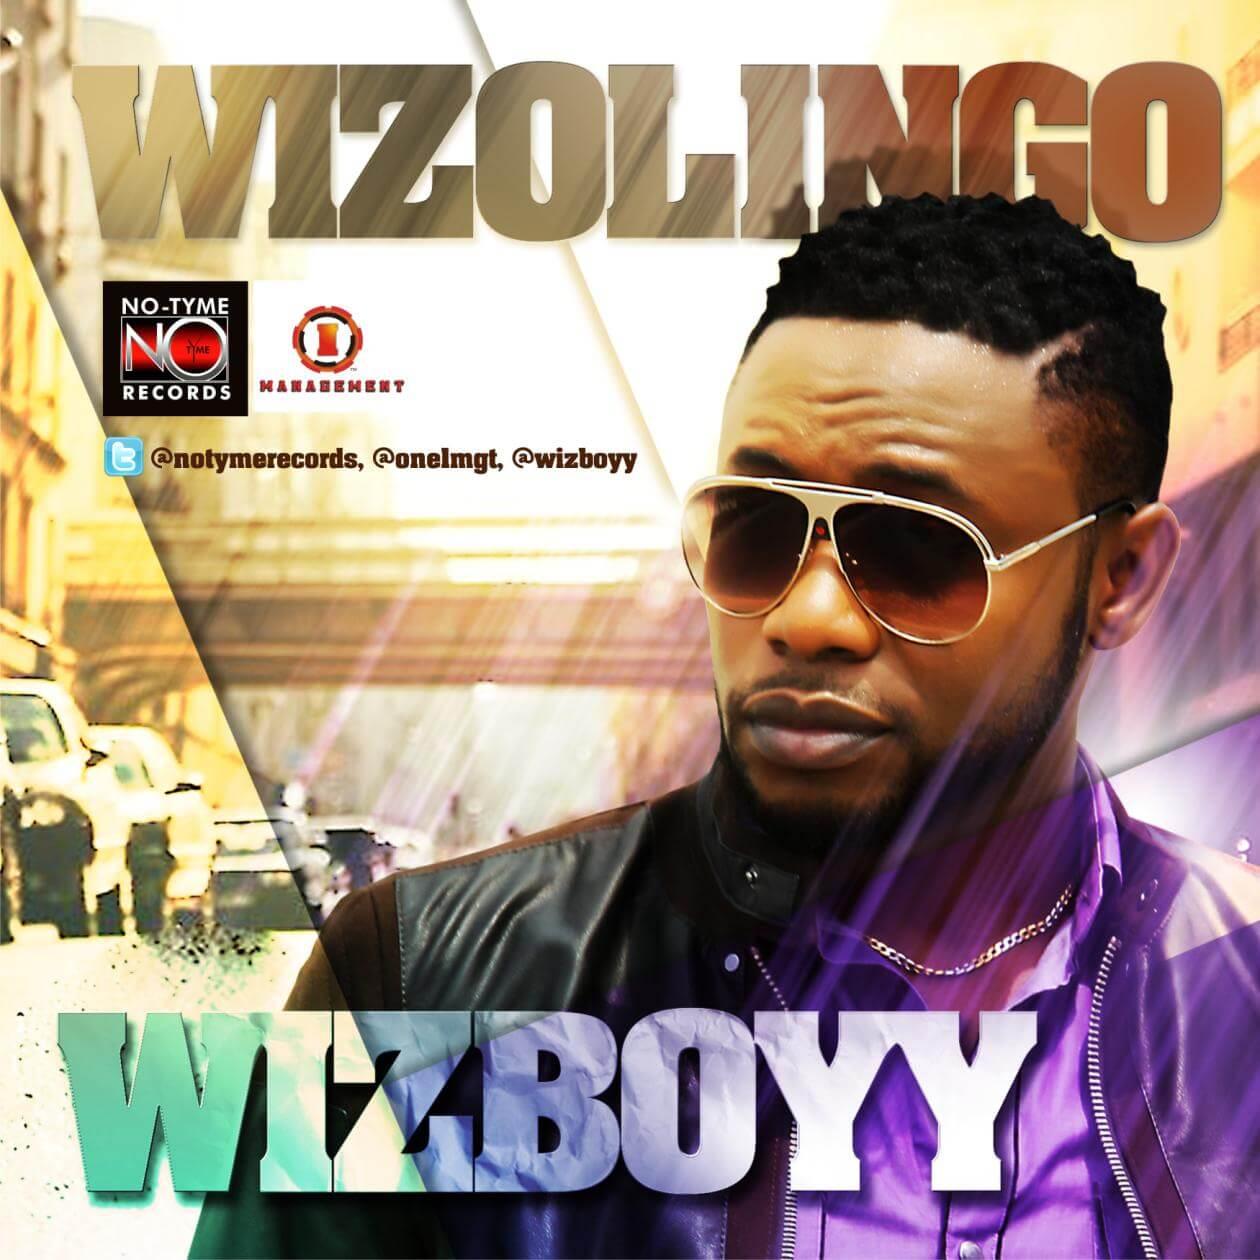 WIZolingo2